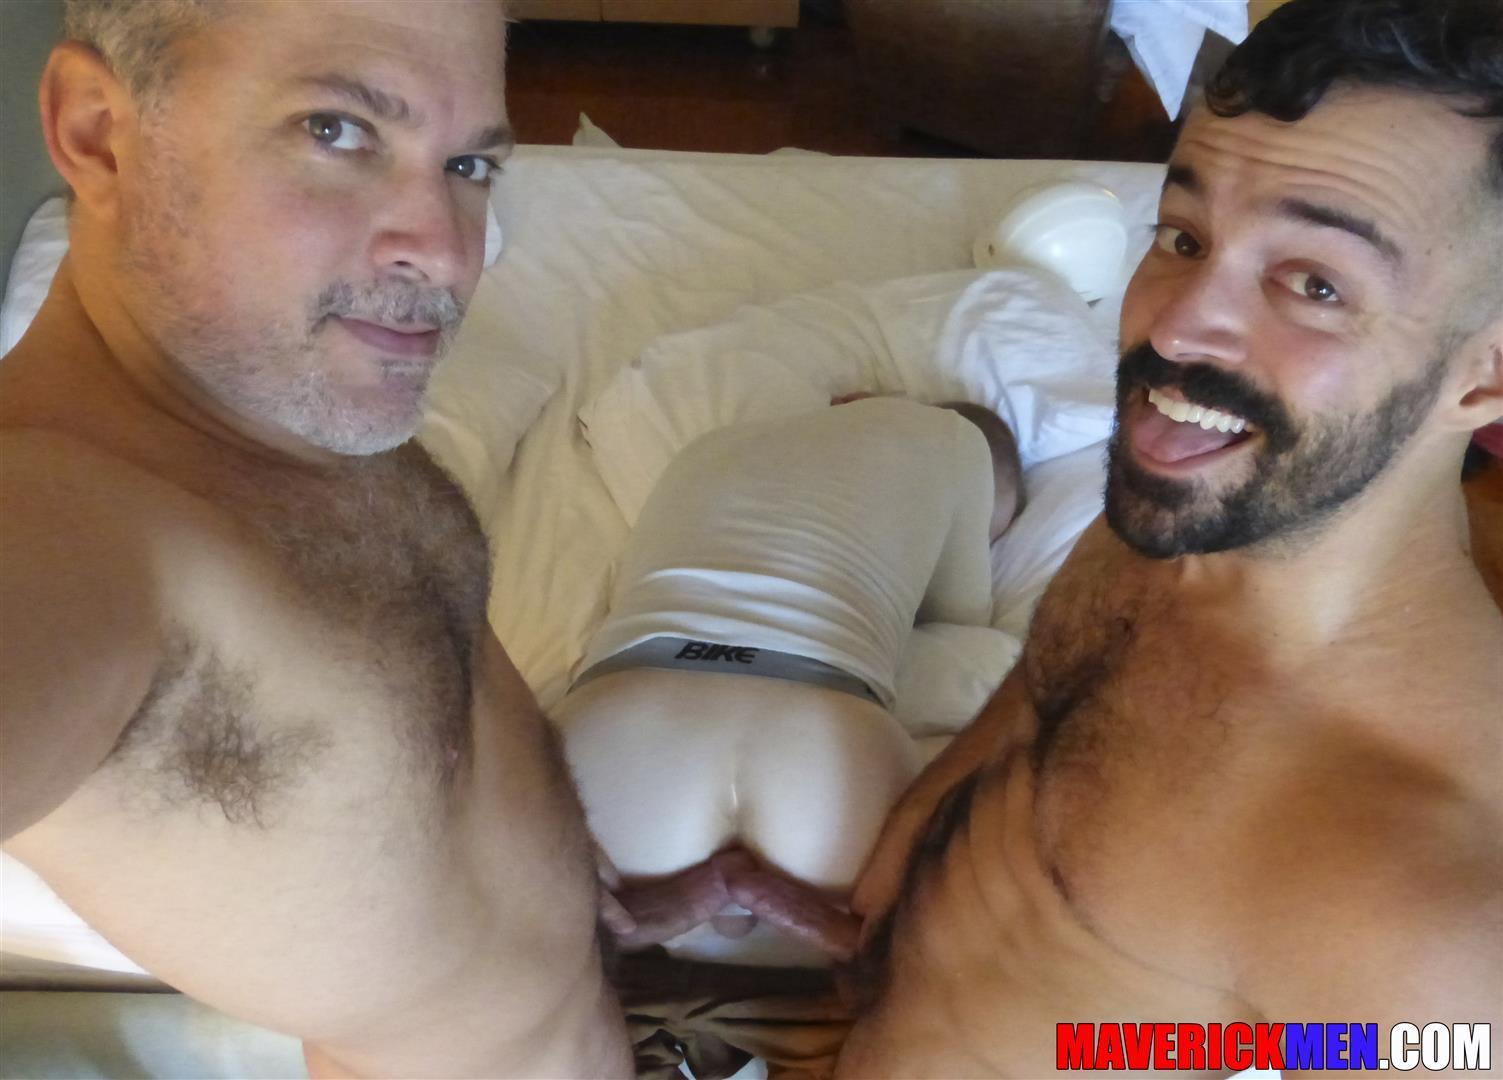 The Maverick Men Erik Naked Blue Collar Guy Getting Barebacked Hairy Ass Amateur Gay Porn 5 Young Blue Collar Guy Gets Barebacked By Two Muscle Daddies